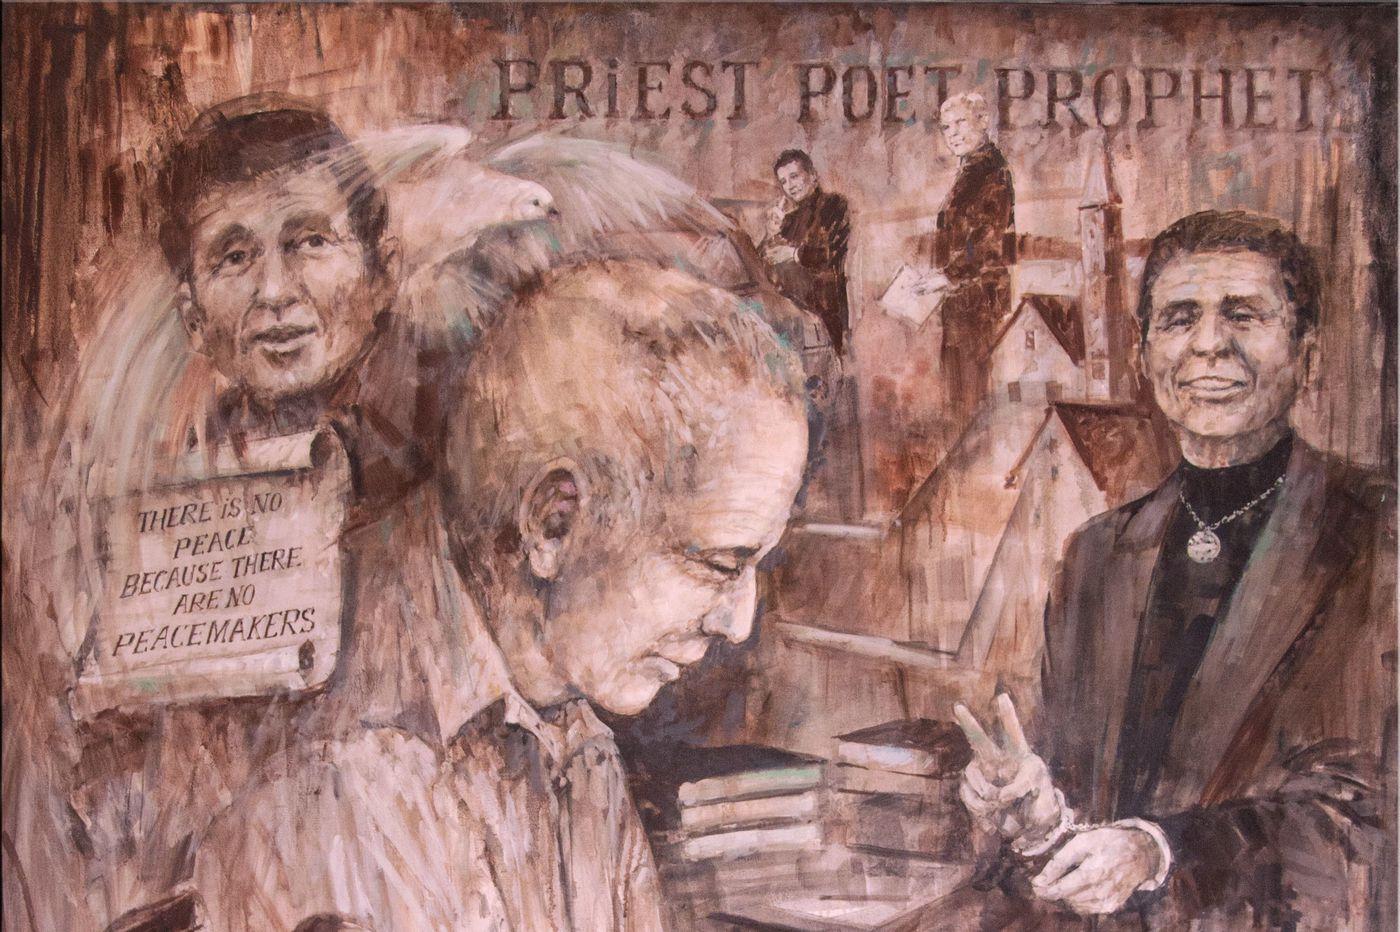 Portrait Honors Villanova Peace Activist Who Opposed Vietnam War